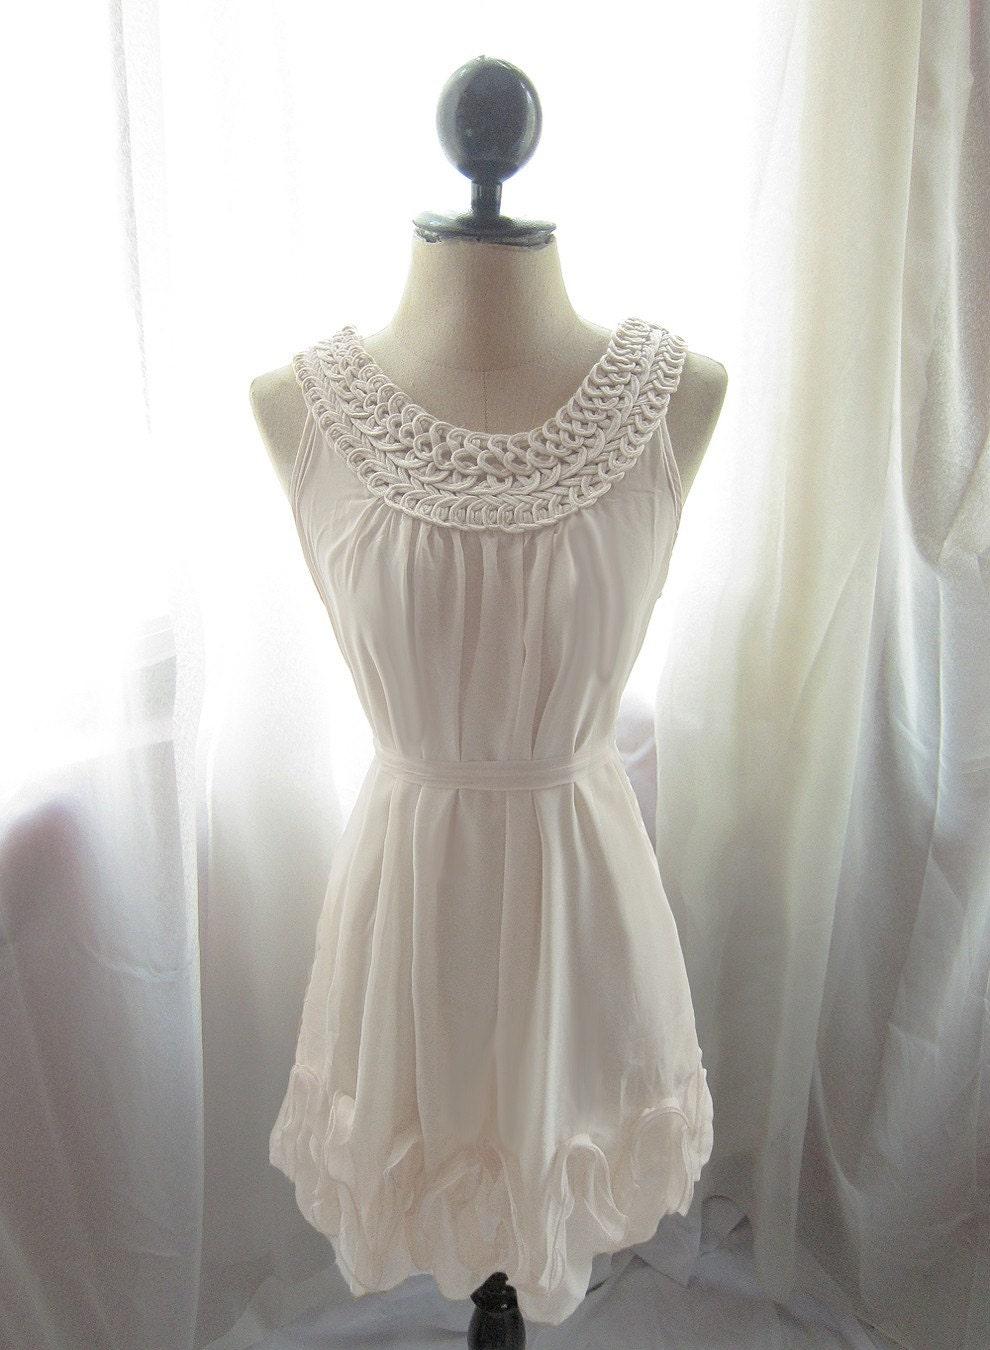 Grecian Romantic Rosette Woven Goddess Dreamy White Chiffon Dress.